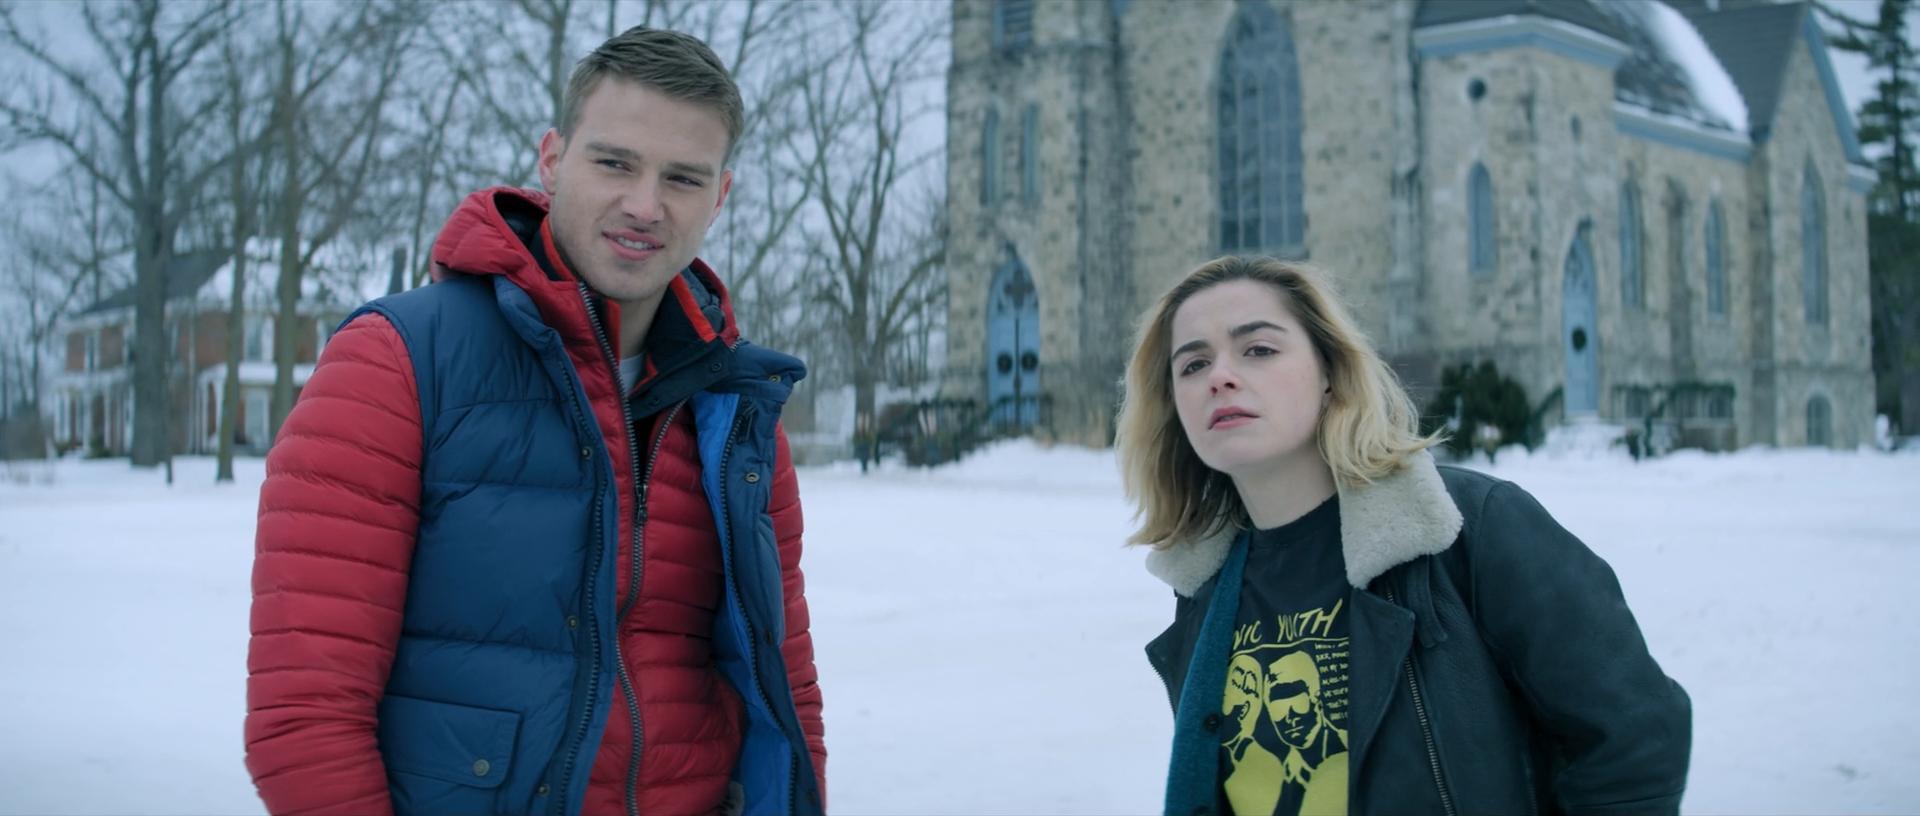 Kiernan Shipka and Matthew Noszka in Let It Snow (2019)